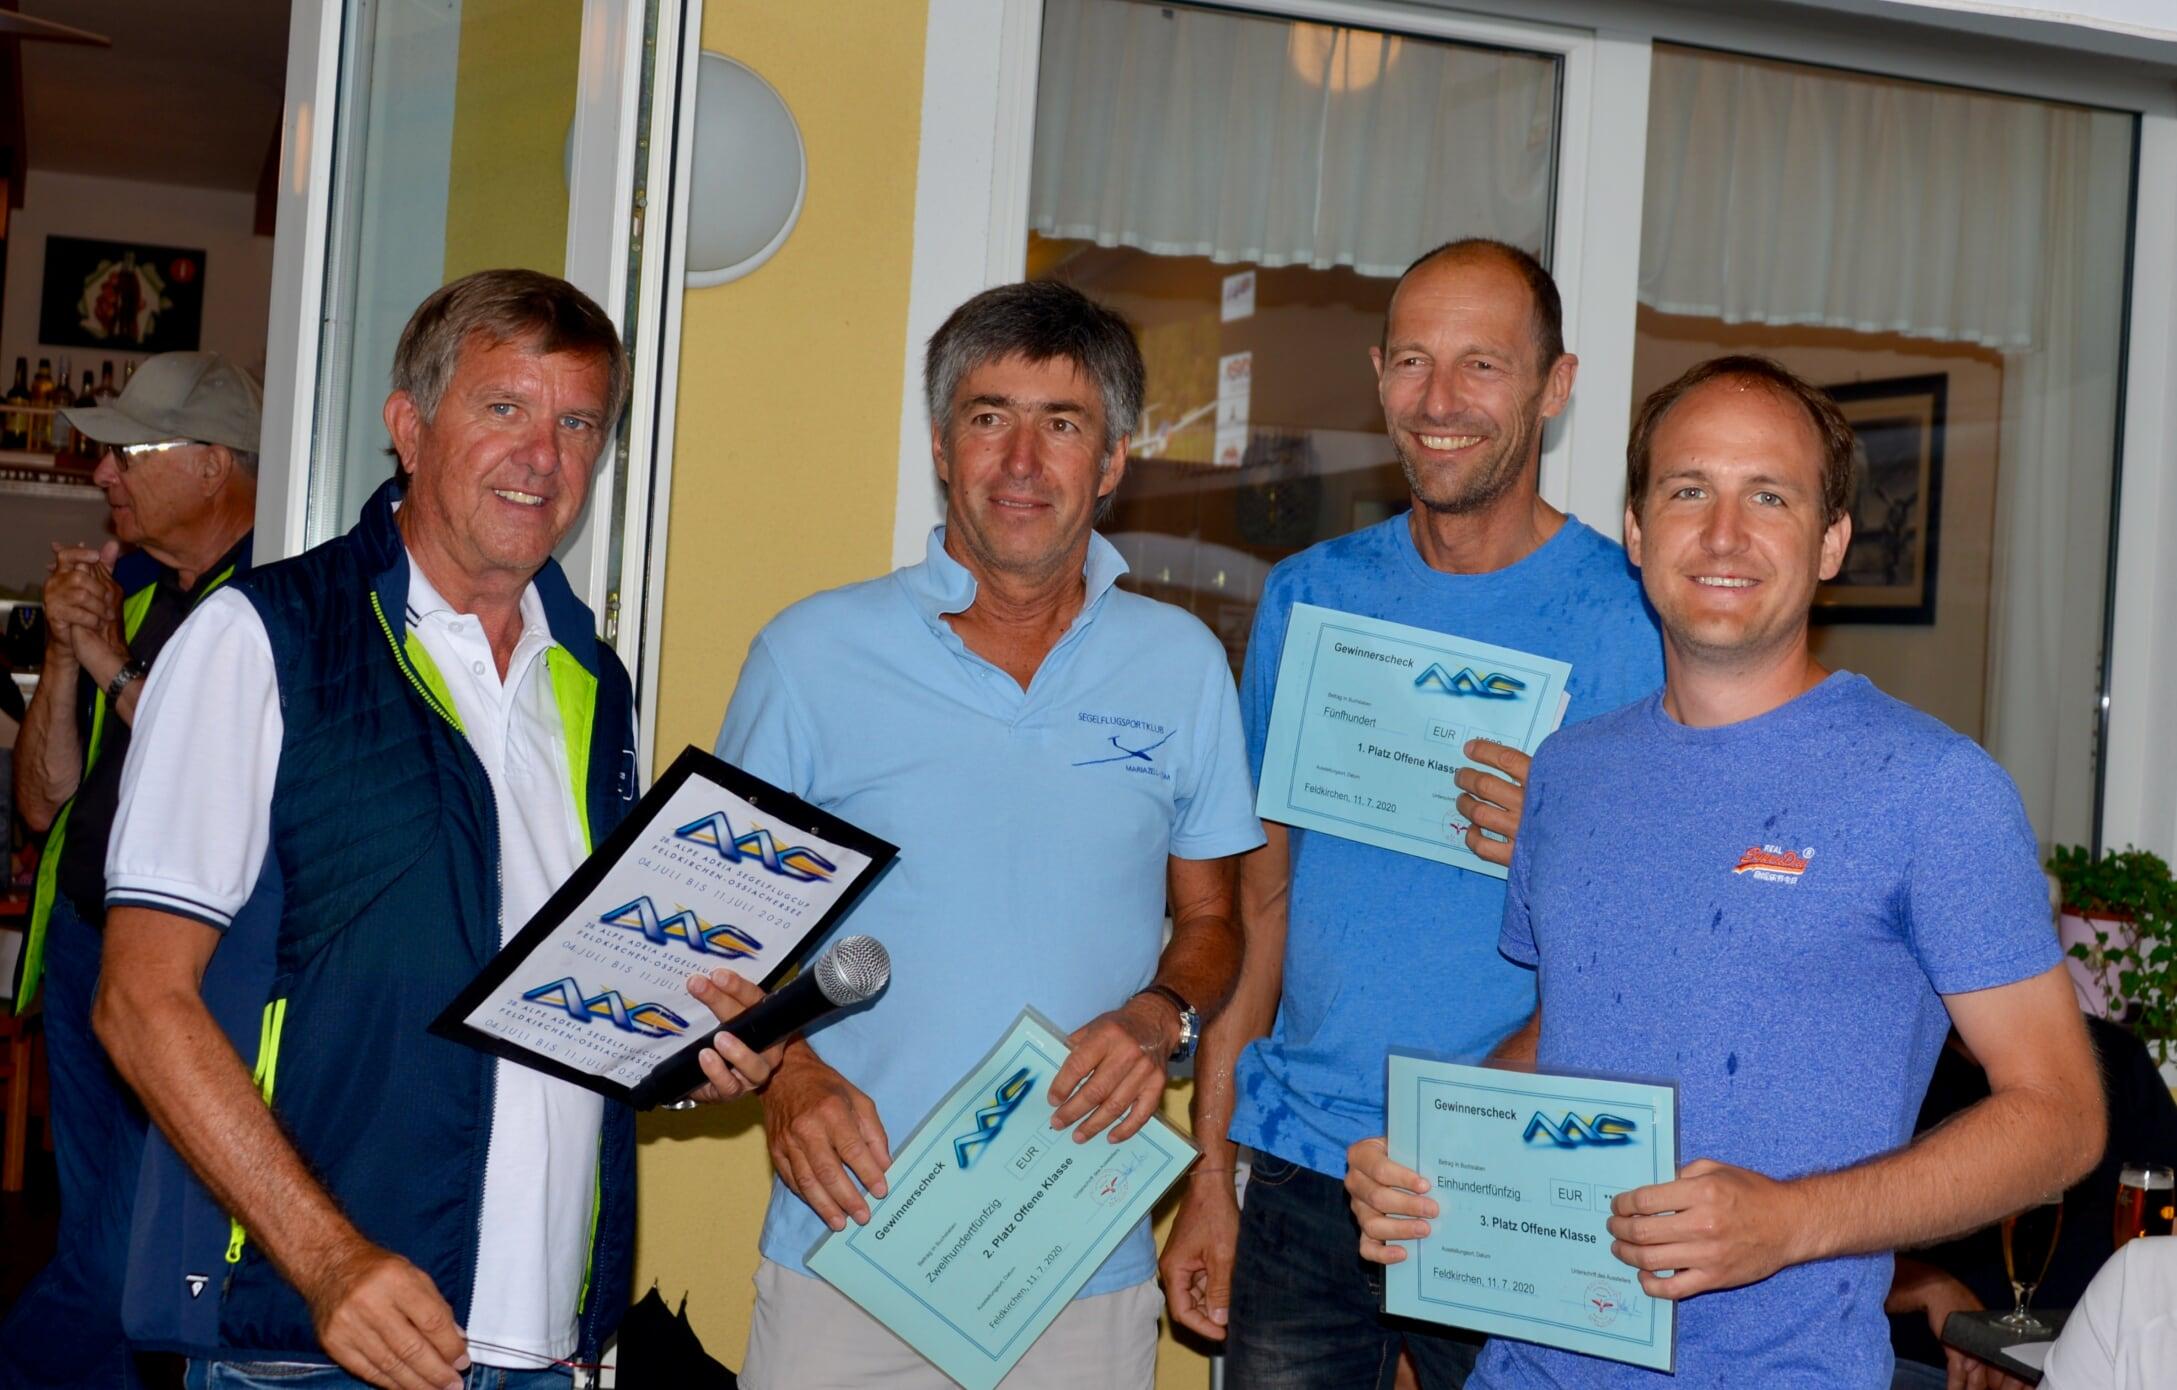 Stefan holt sich den 3. Rang am Alpe-Adria-Cup